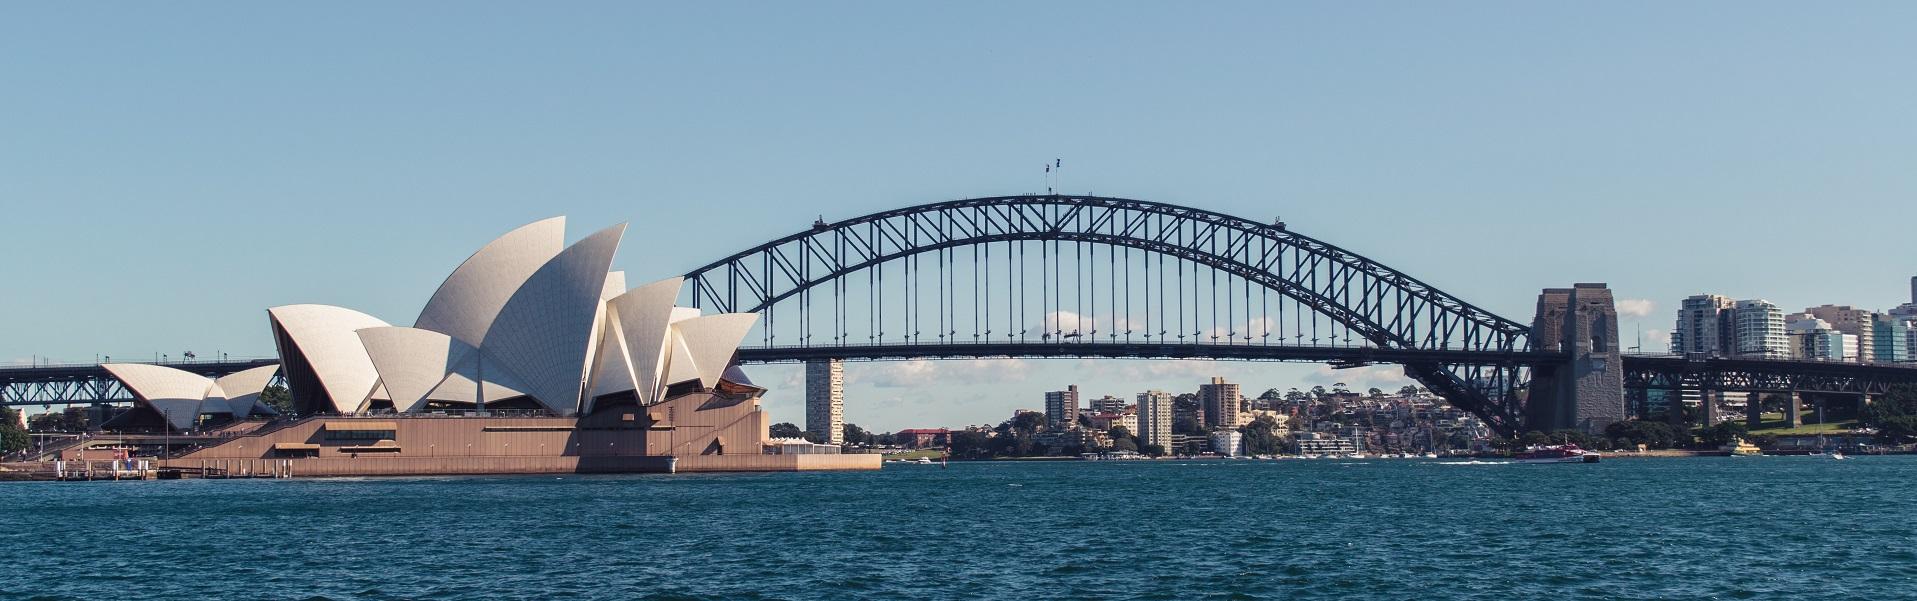 Blick vom Ufer auf das Sydney Opera House